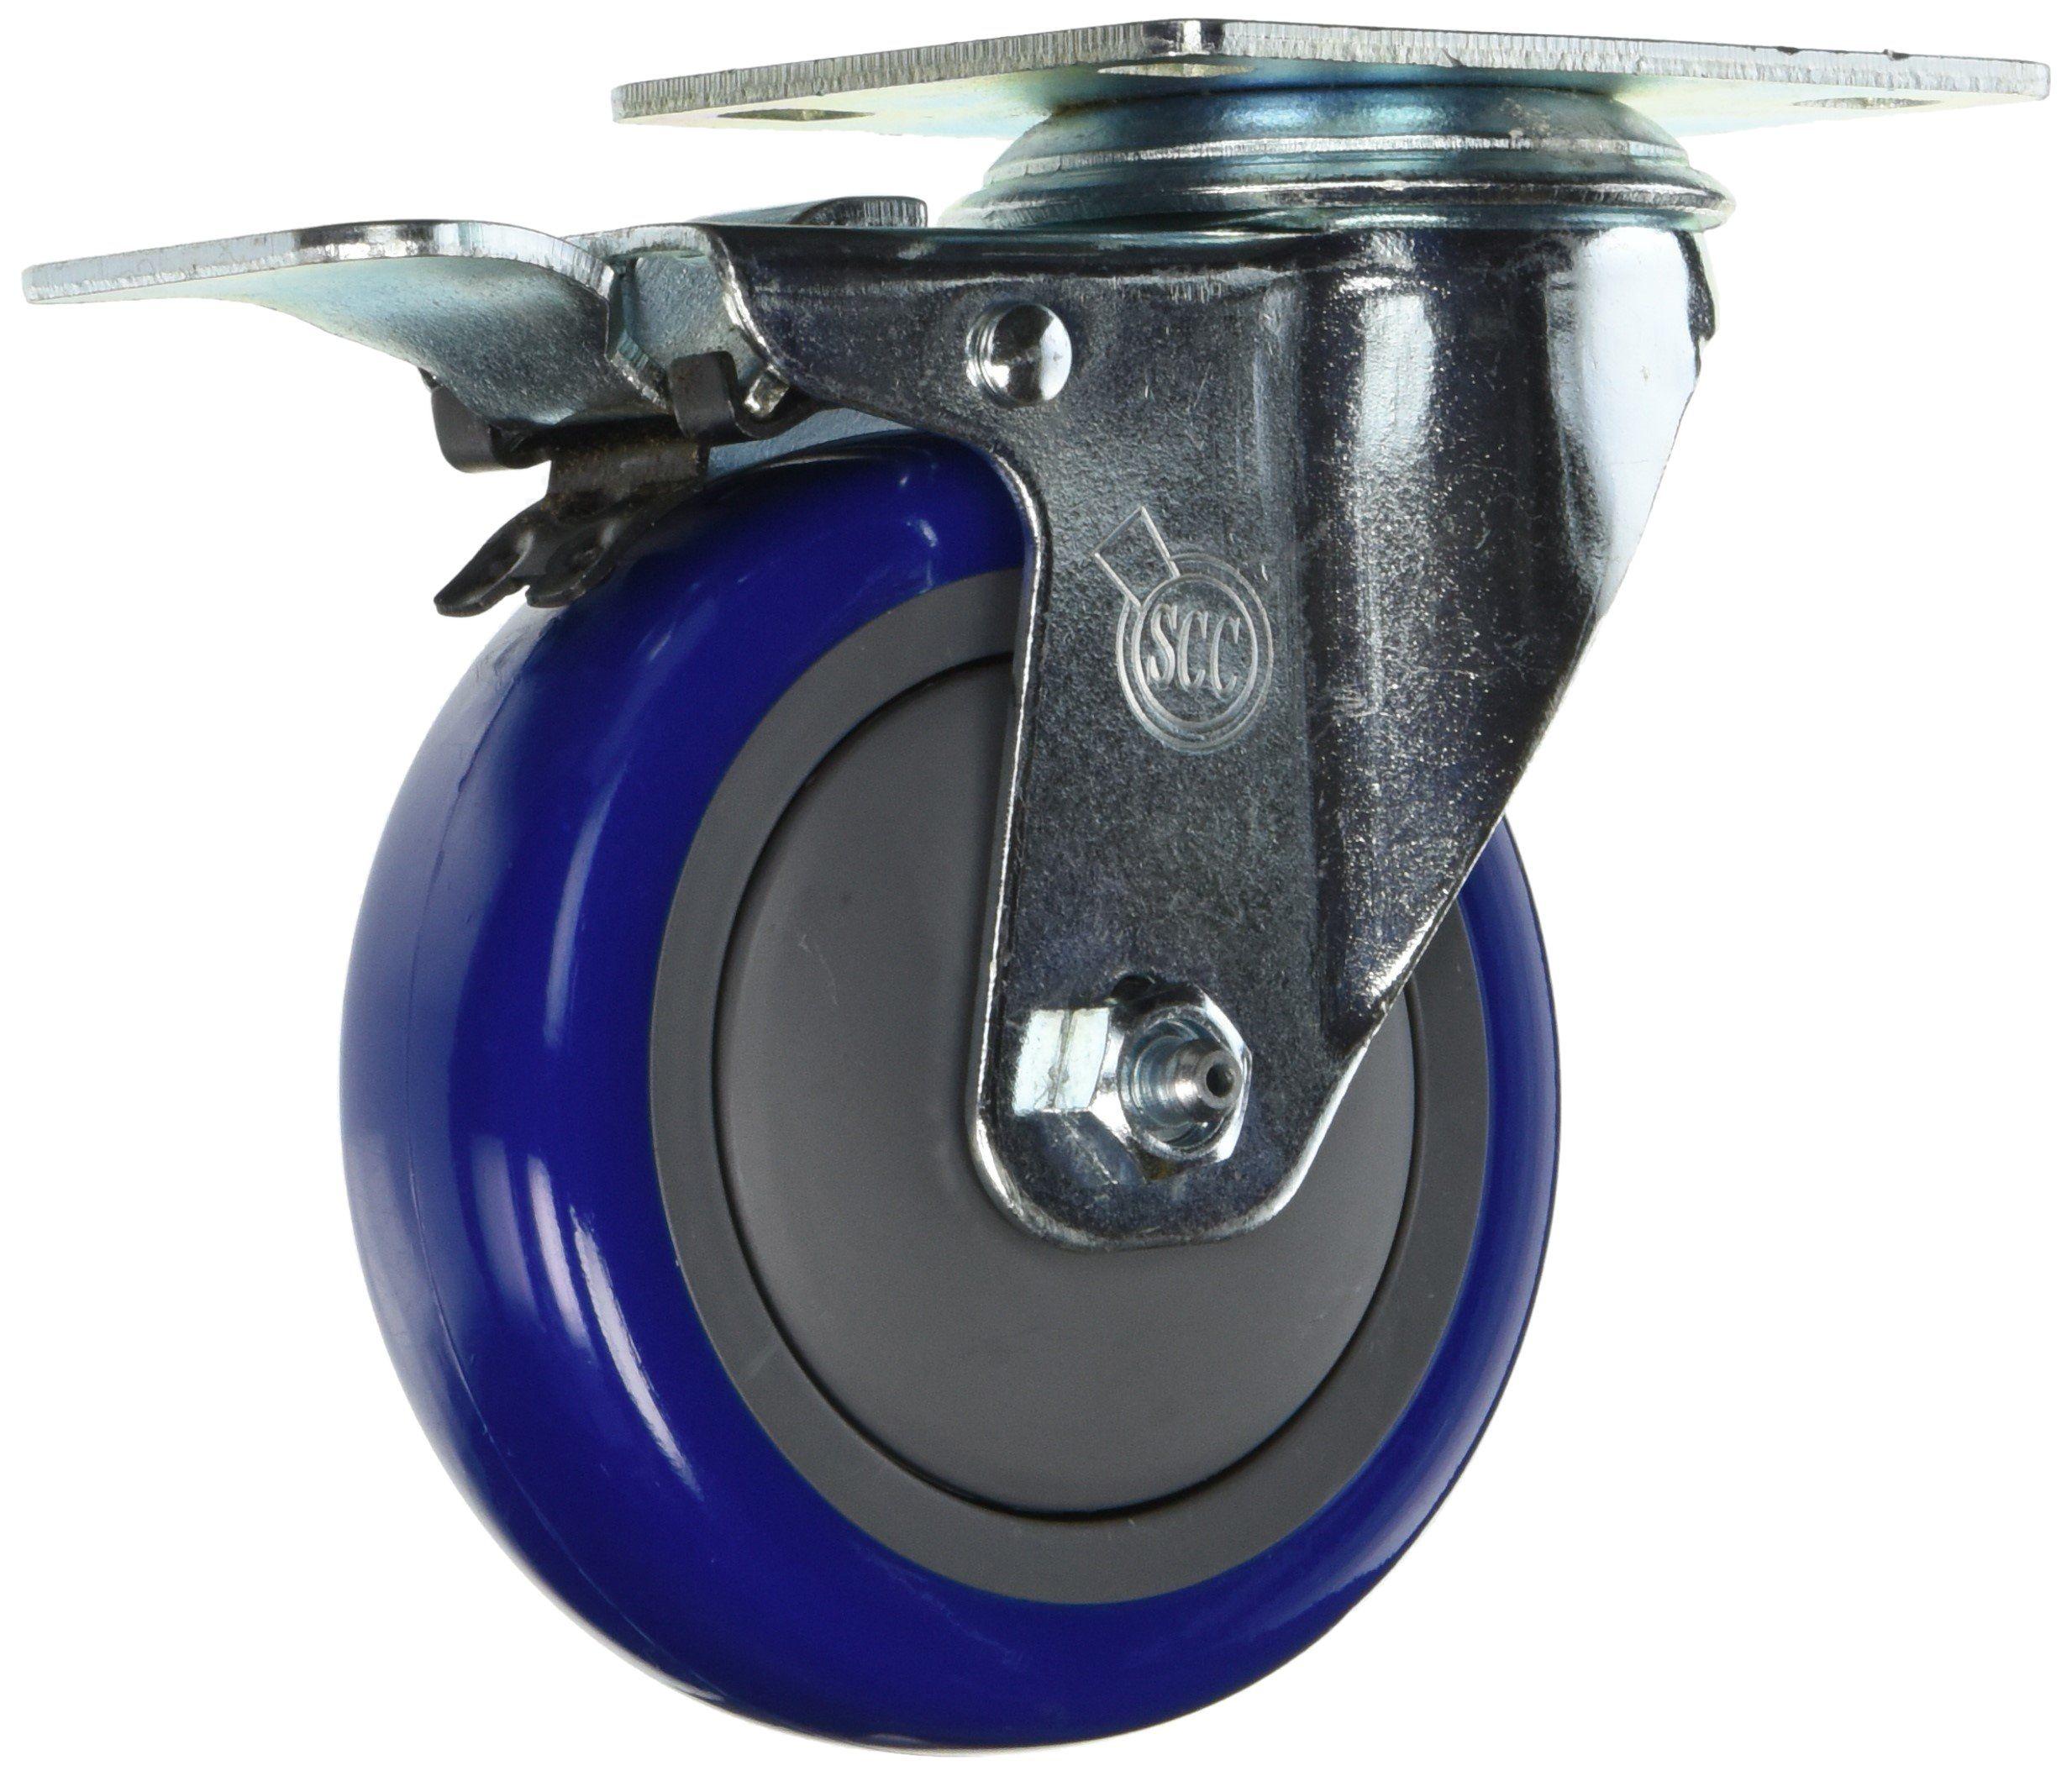 Service Caster SCC TTL20S414 PPUB BLUE 4 Swivel Caster Total Lock